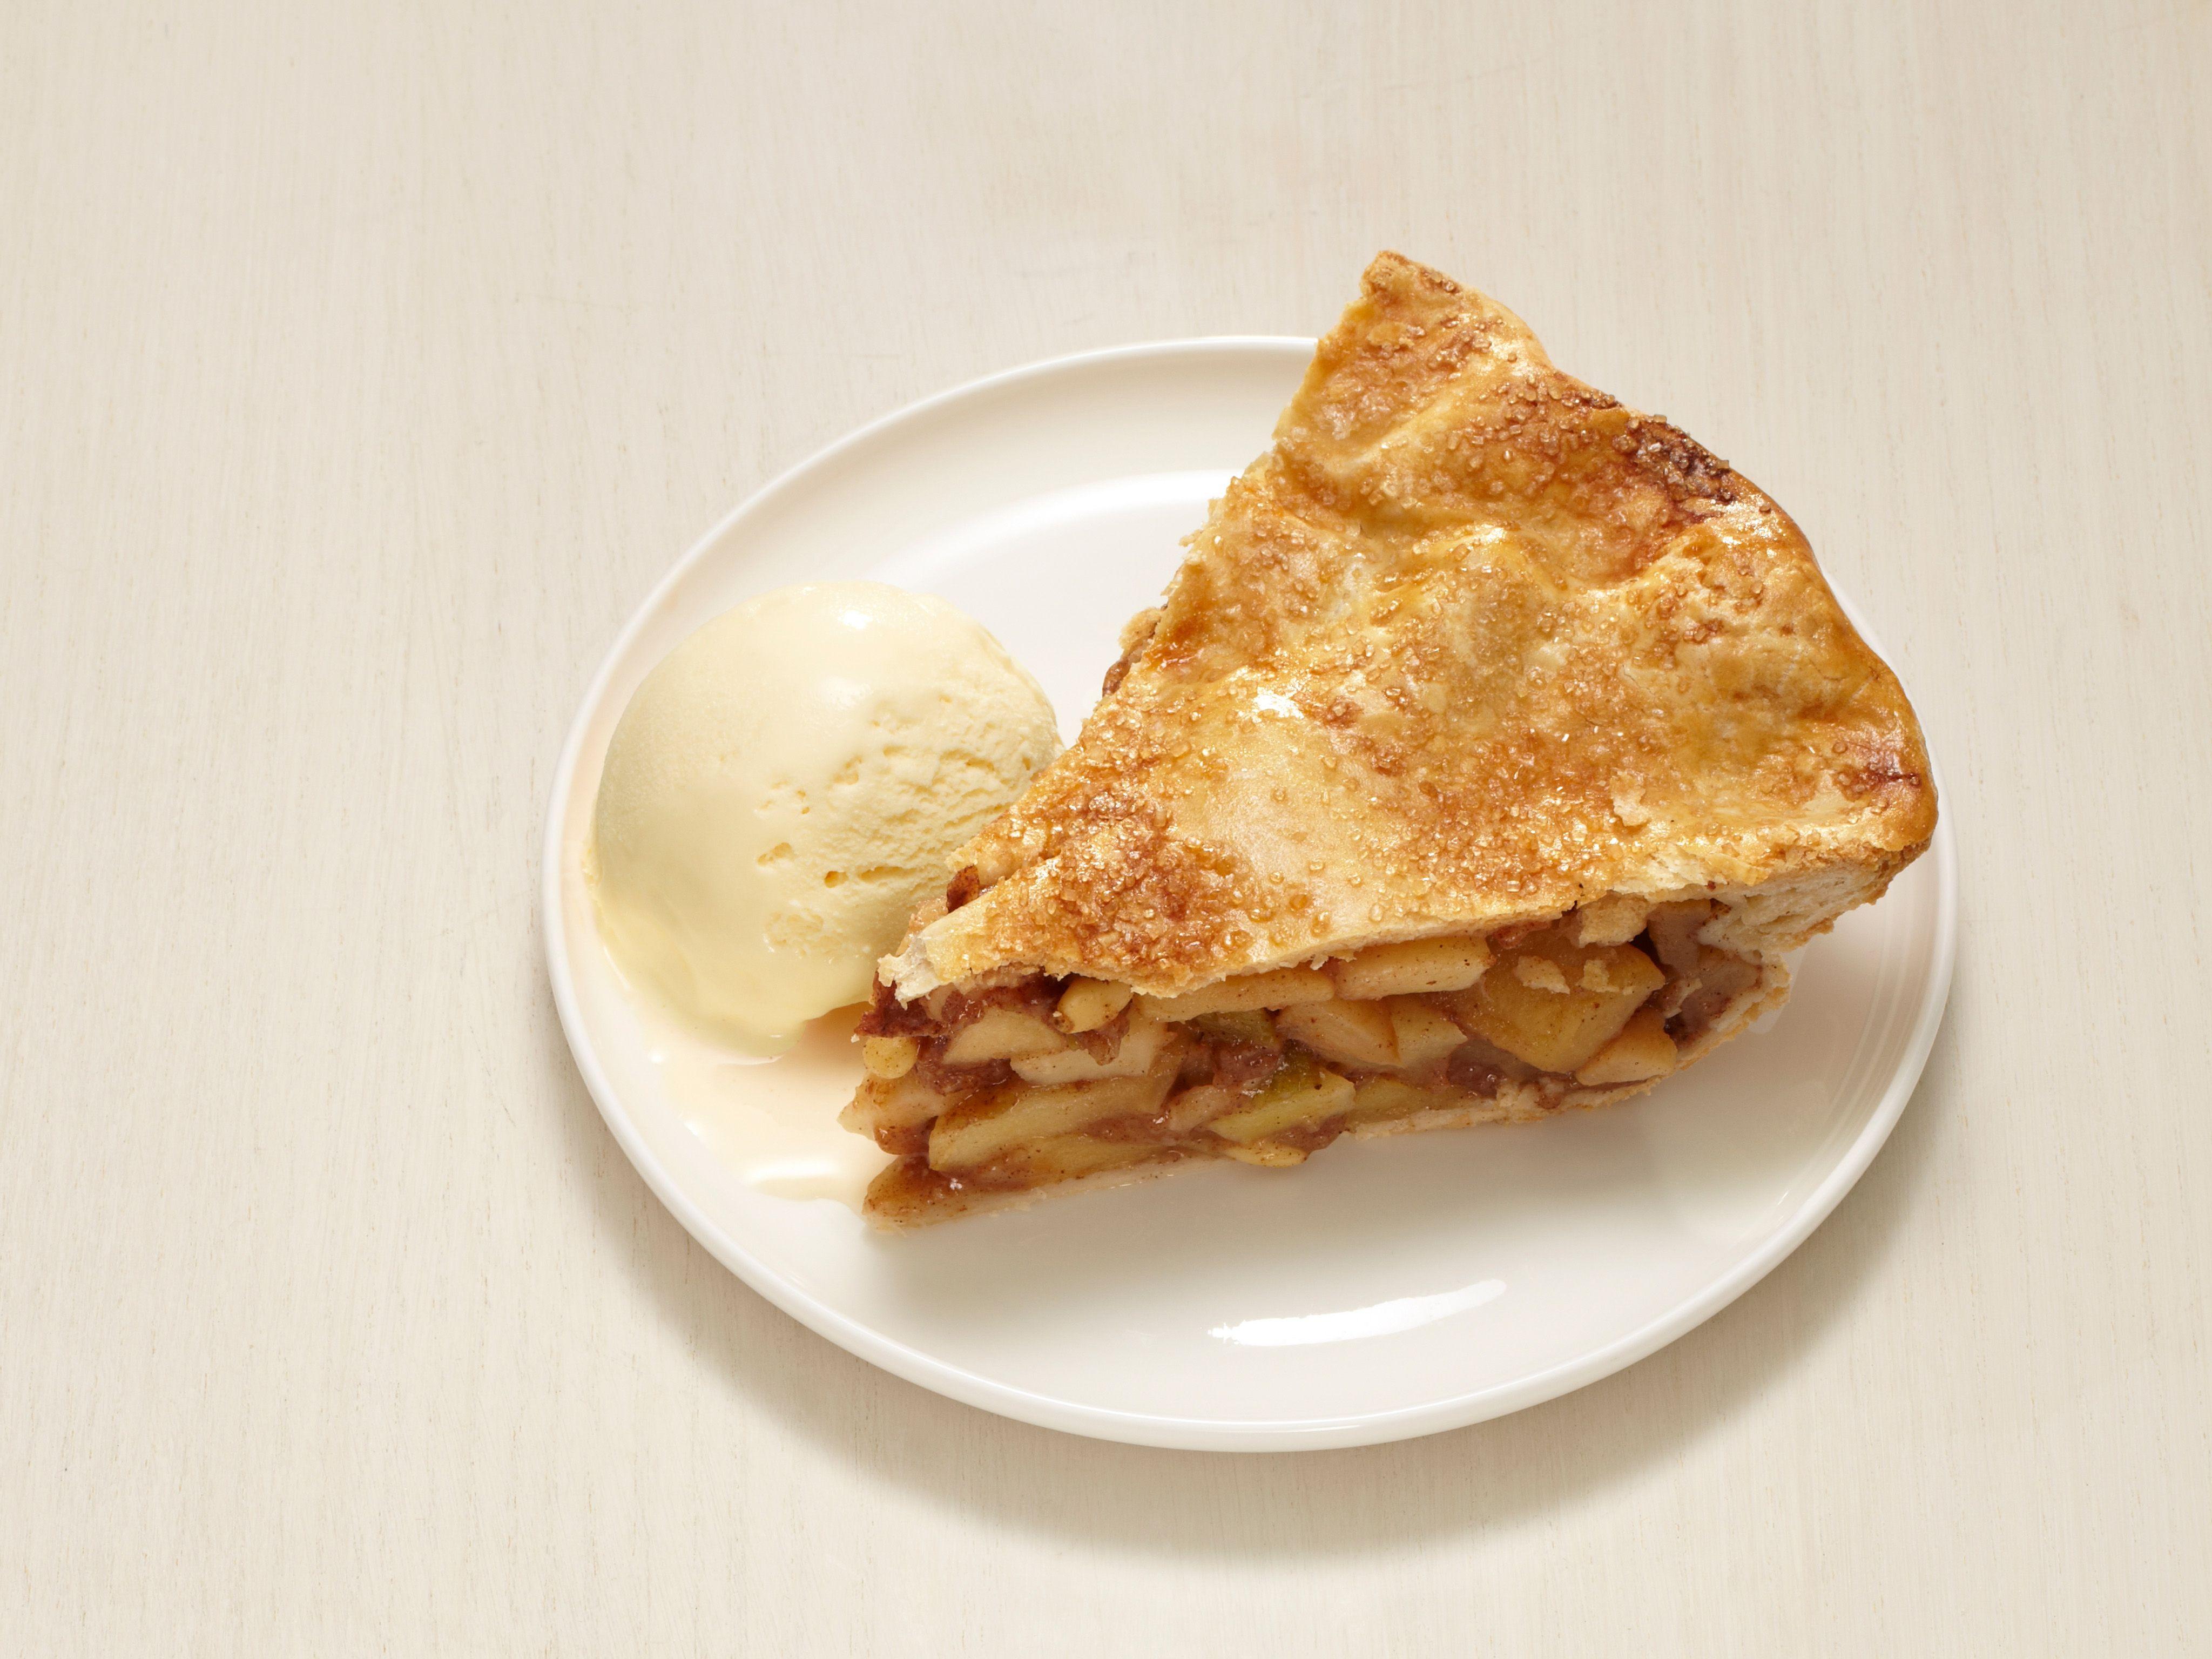 New mexican apple pie recipe apple pie recipes pie recipes and new mexican apple pie recipe apple pie recipes pie recipes and apple pie forumfinder Choice Image